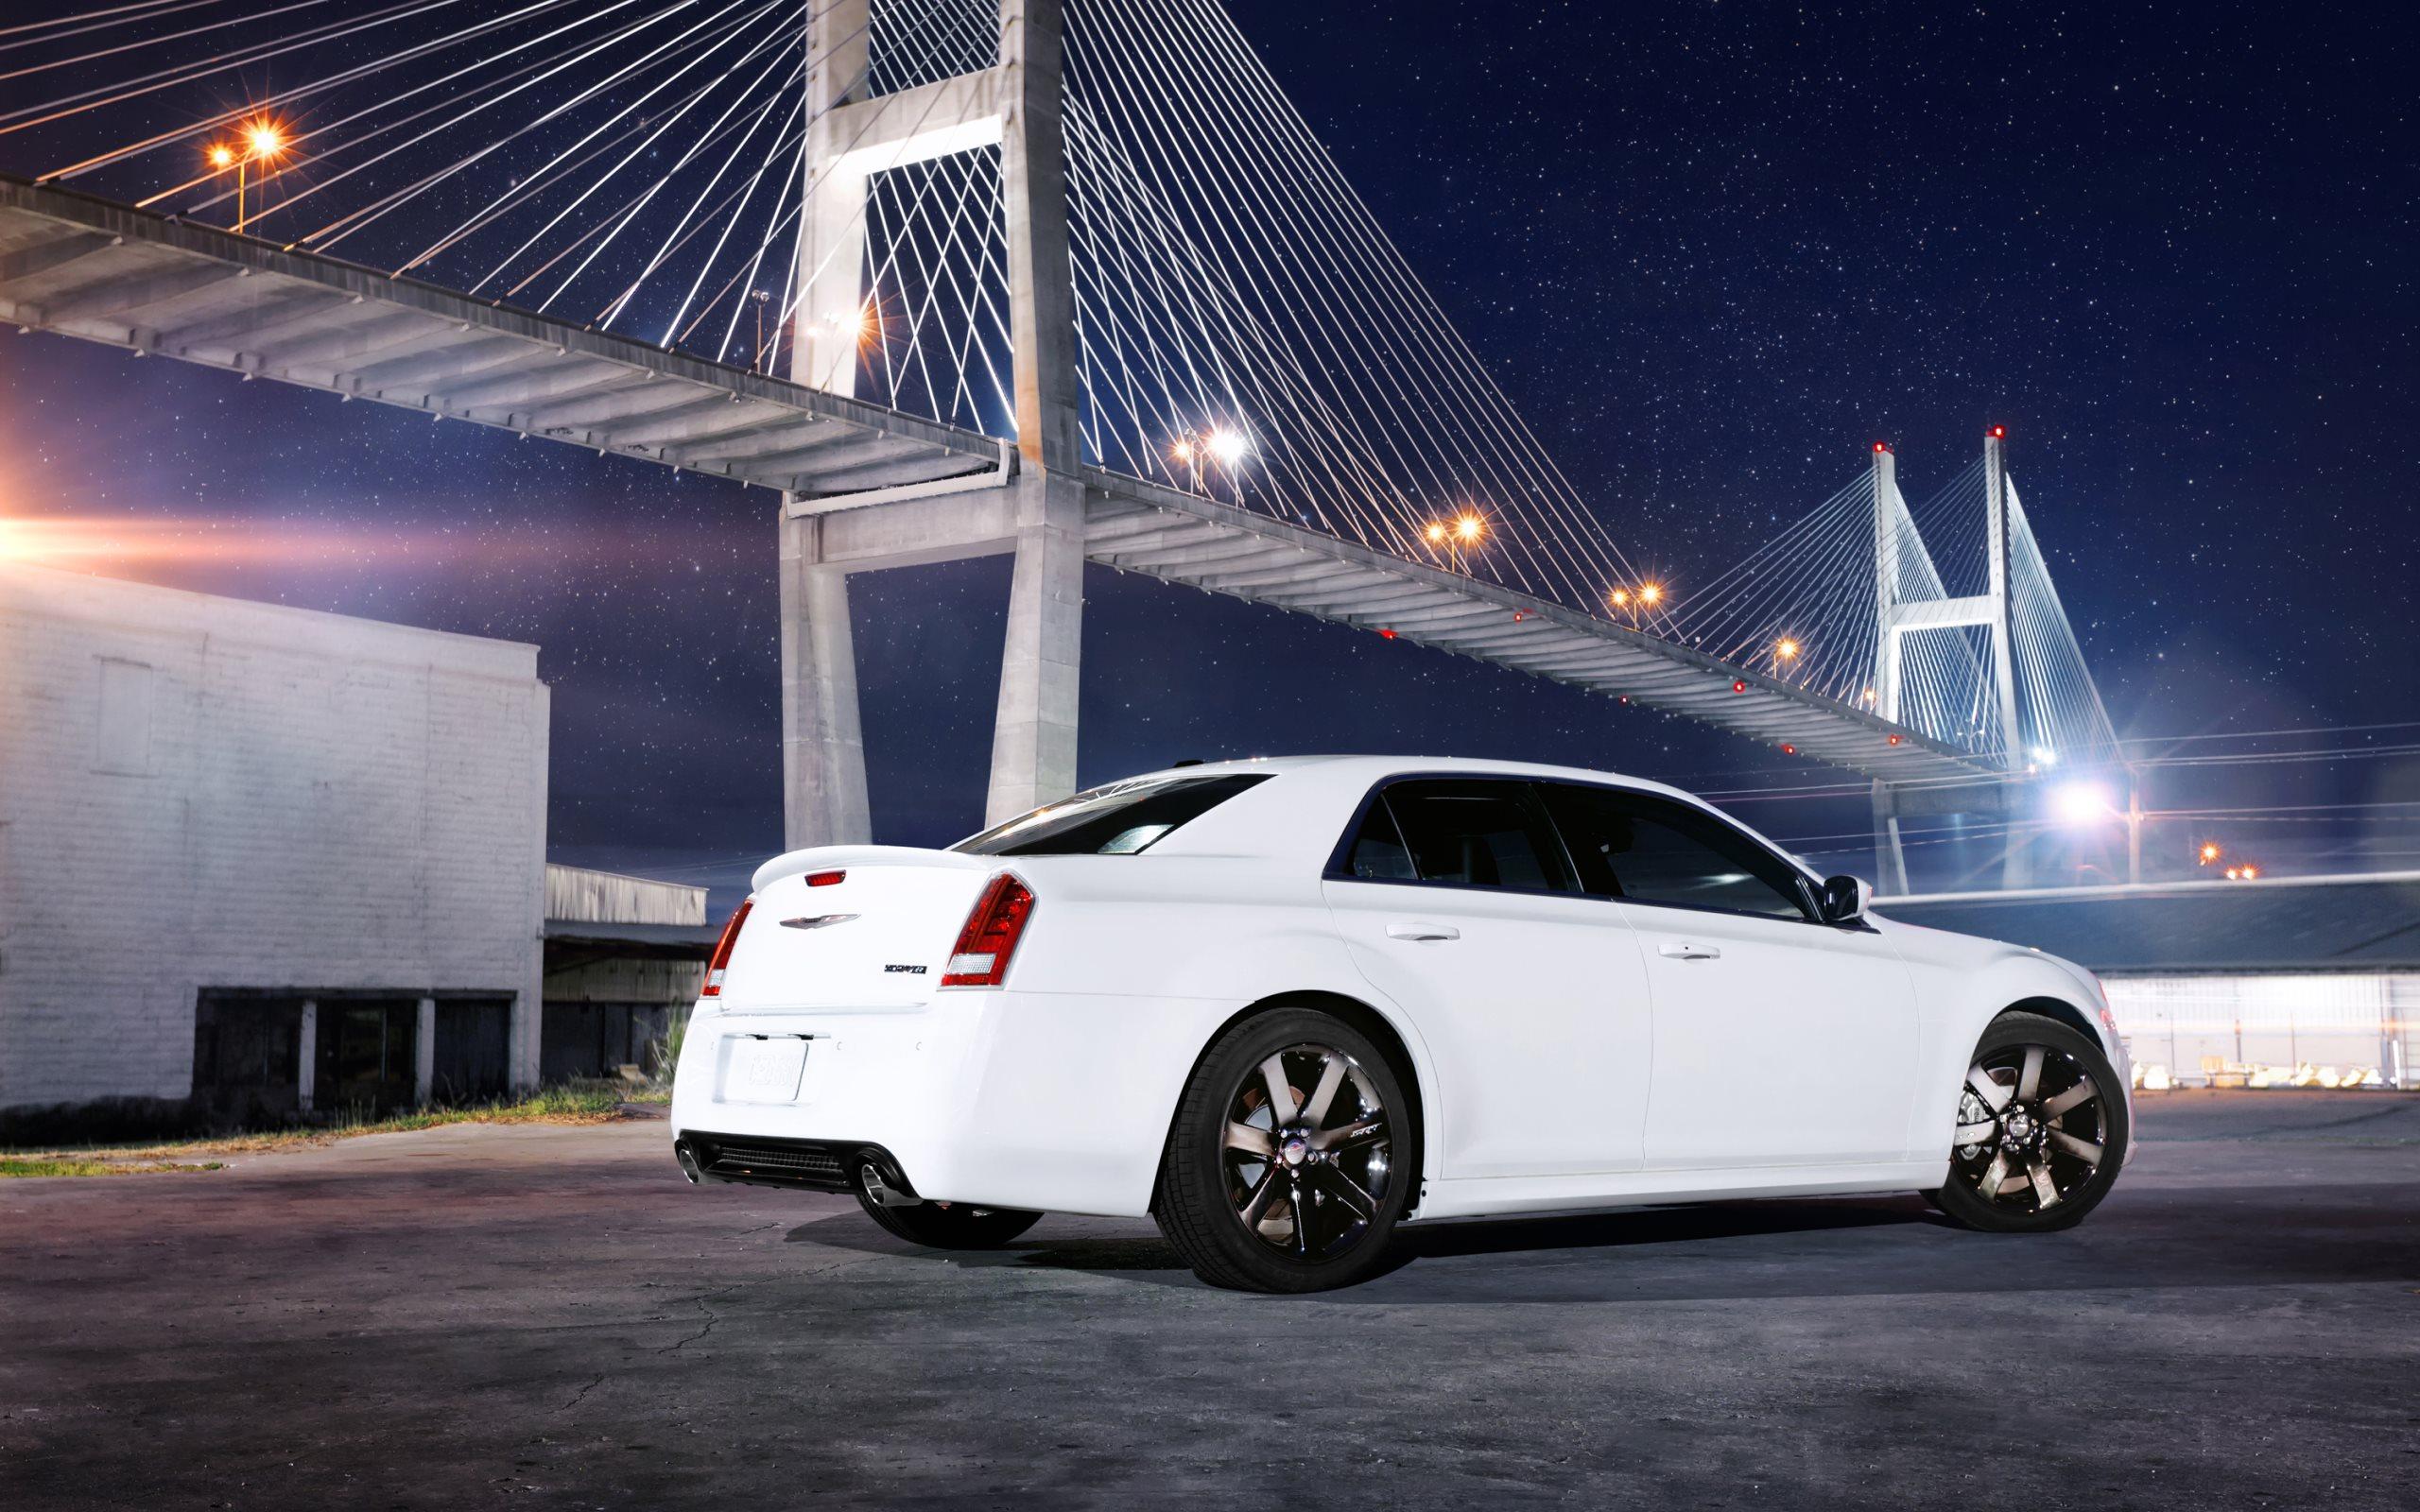 dsc used lifestyle auto abbotsford group vehicle chrysler srt car dealer